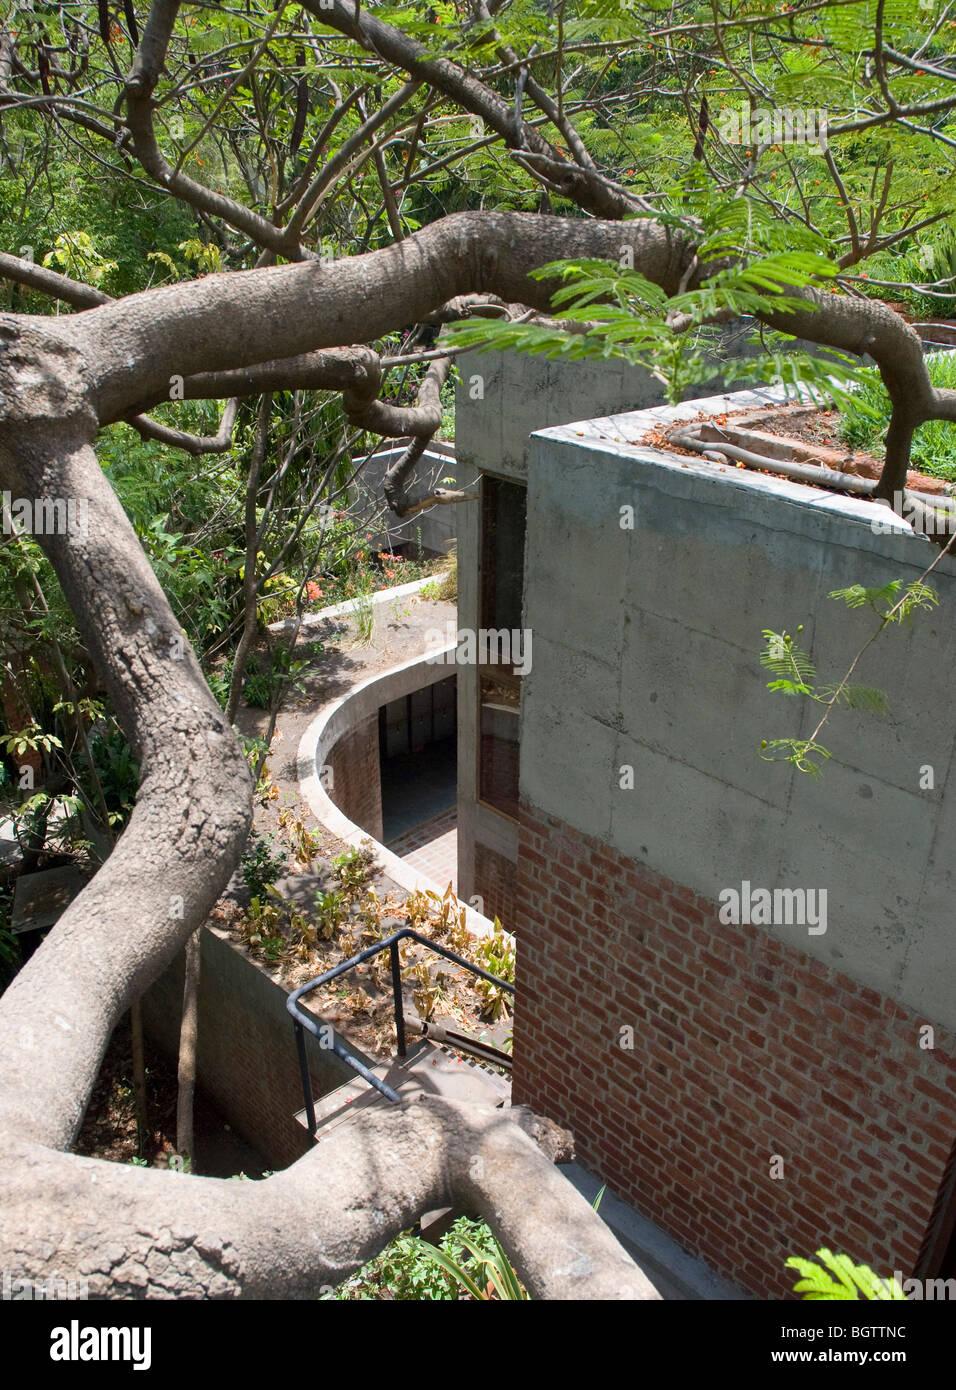 SARABHAI HOUSE, AHMEDABAD, INDIA, LE CORBUSIER - Stock Image